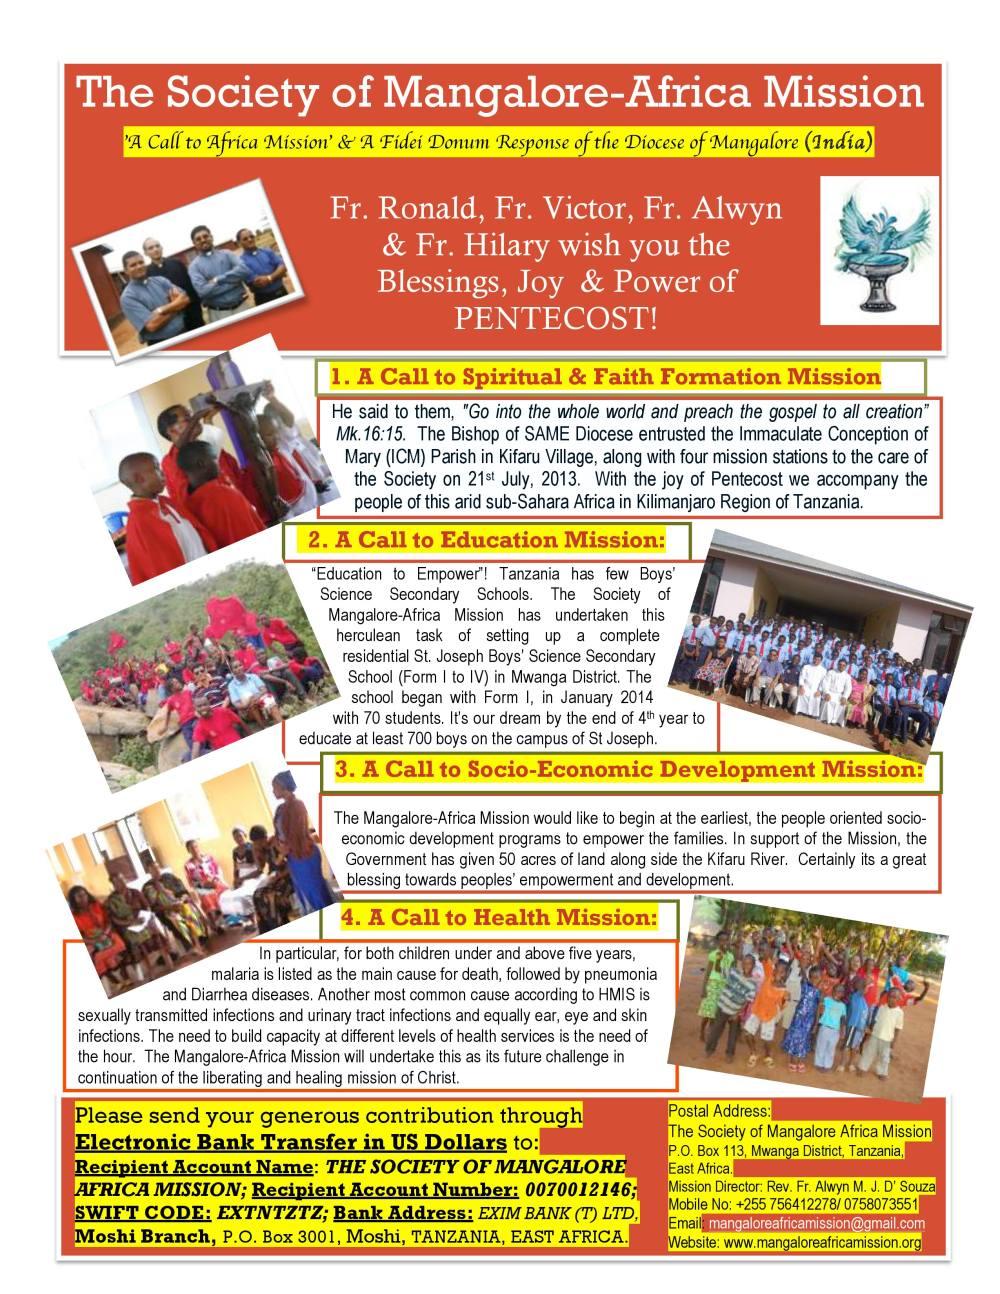 Hoekbank N Joy Mission.Mangalore Africa Mission Wish You The Blessings Joy And